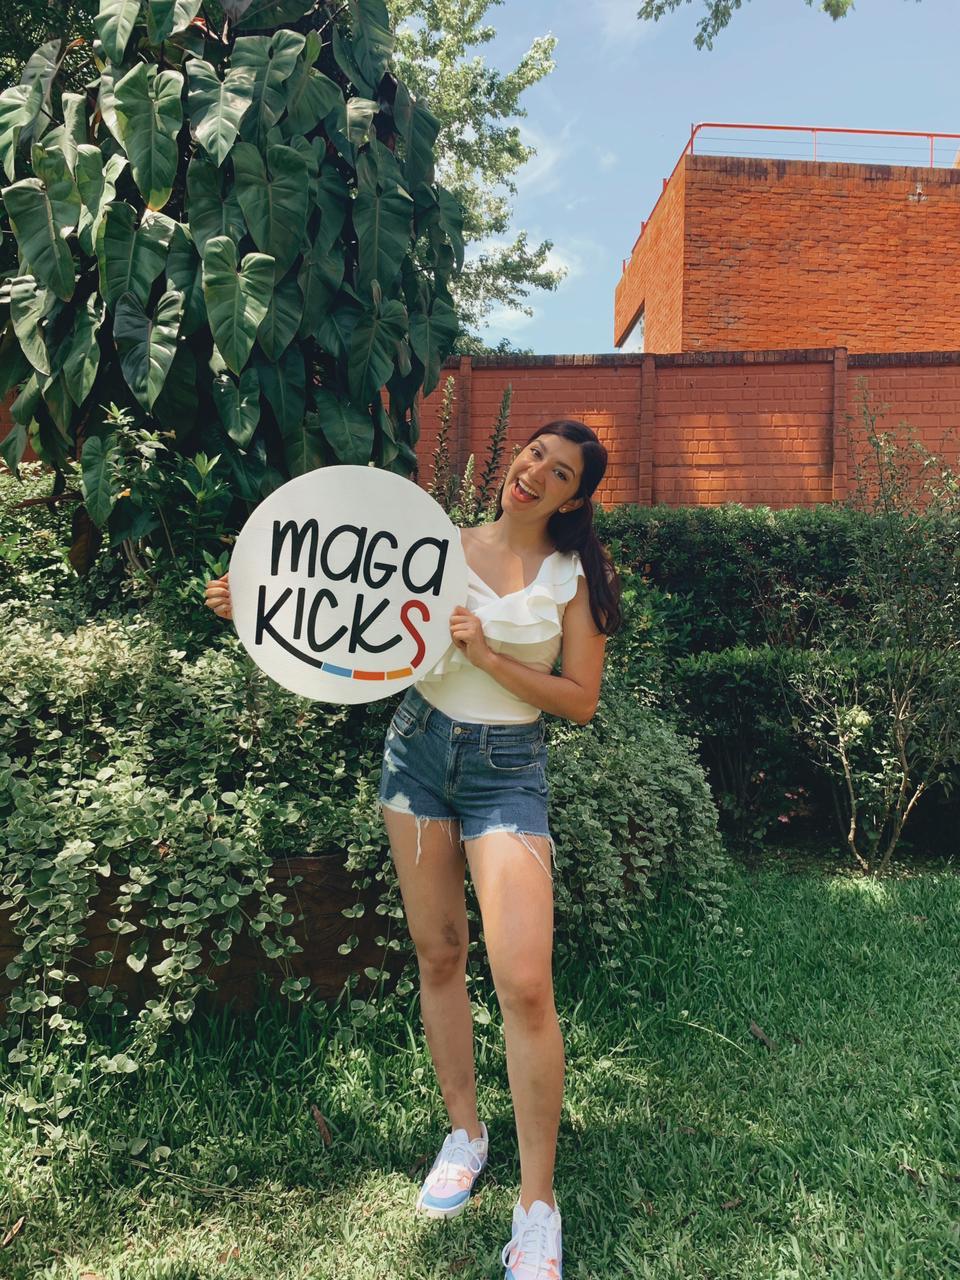 Maga-Kicks: el arte de restaurar zapatos imagen